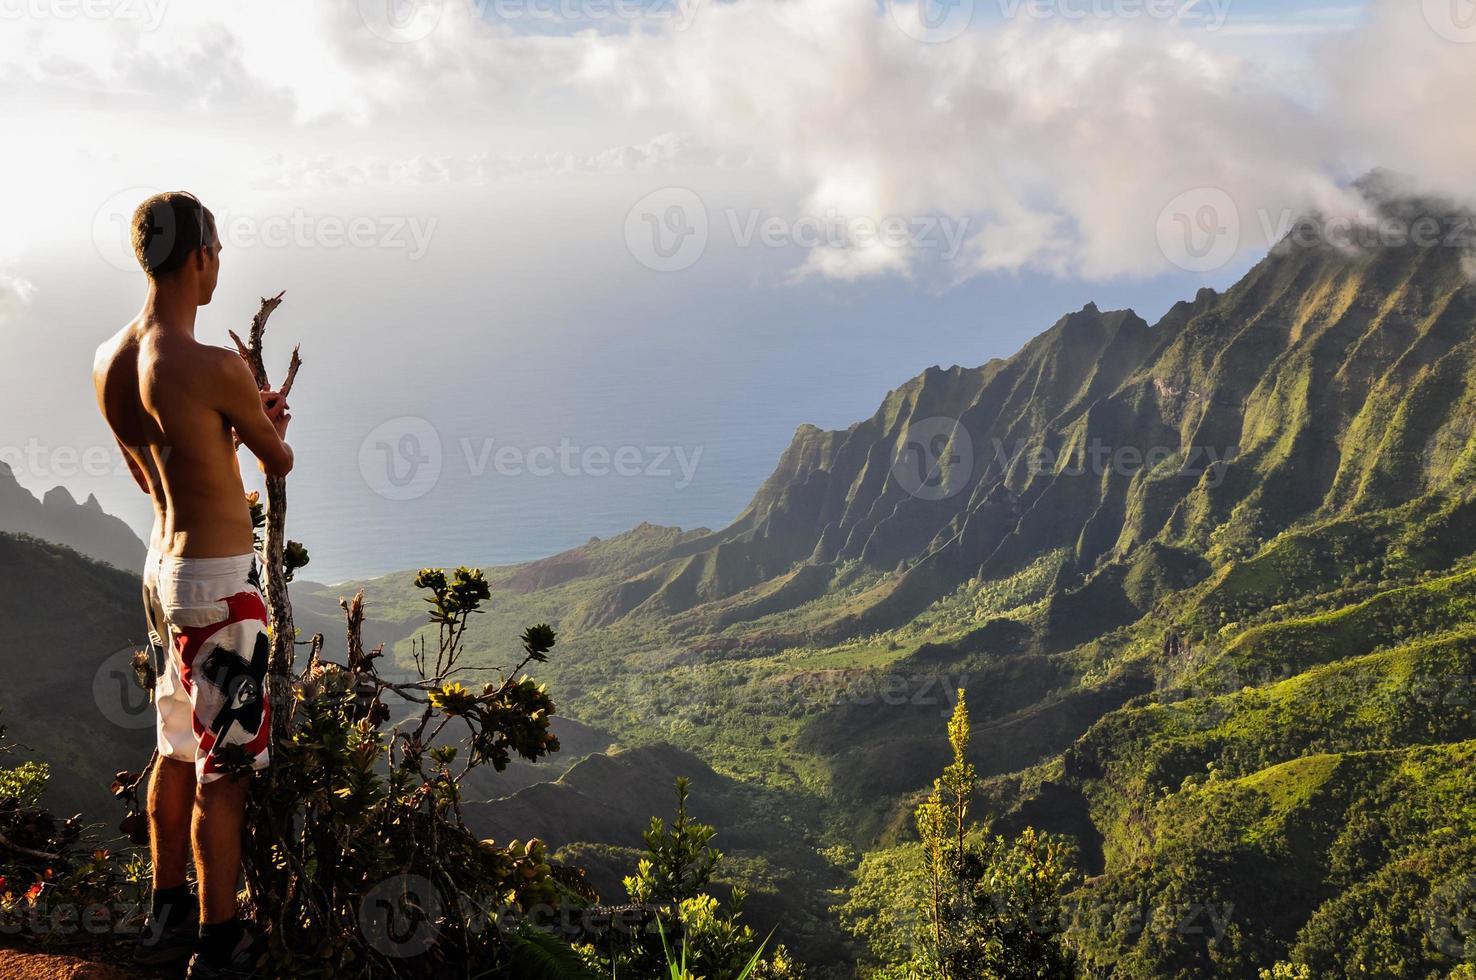 homem olha sobre o vale do kalalau em kauai, Havaí na primavera foto